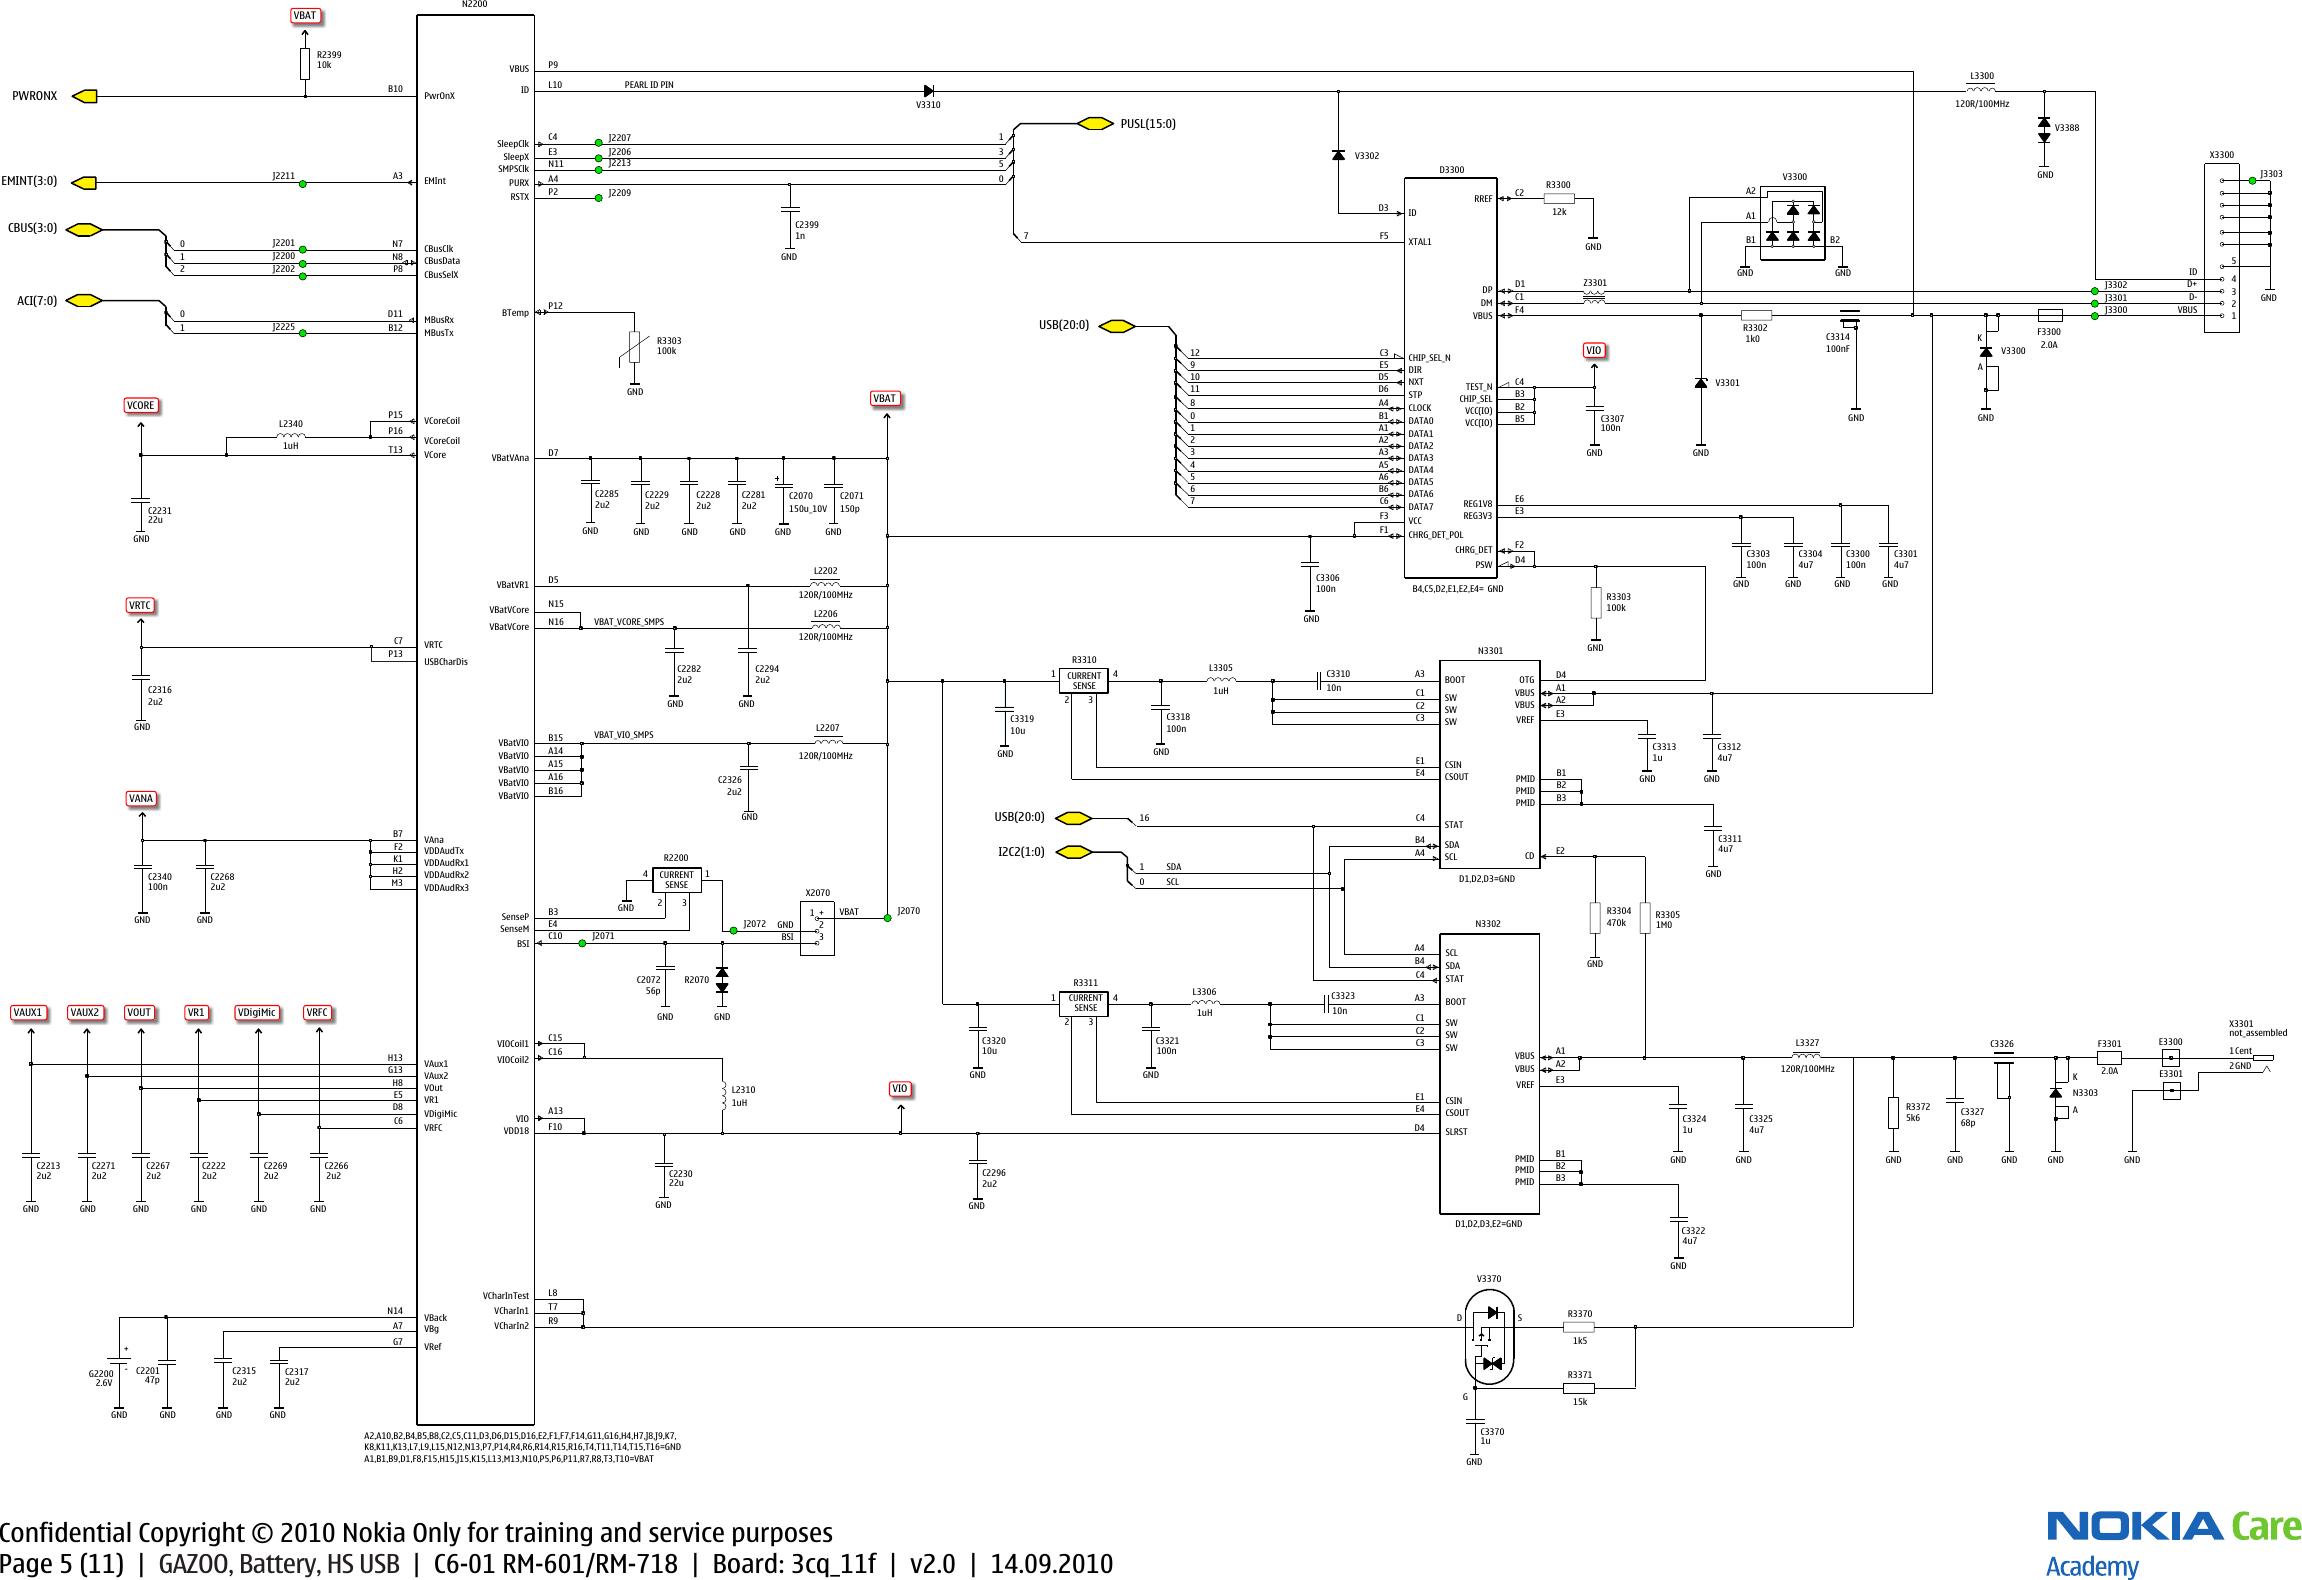 Schematic Diagram Nokia C1 01 Electrical Wiring Diagrams Circuit Of X202 C6 Rm 601 718 Service Schematics V2 X2